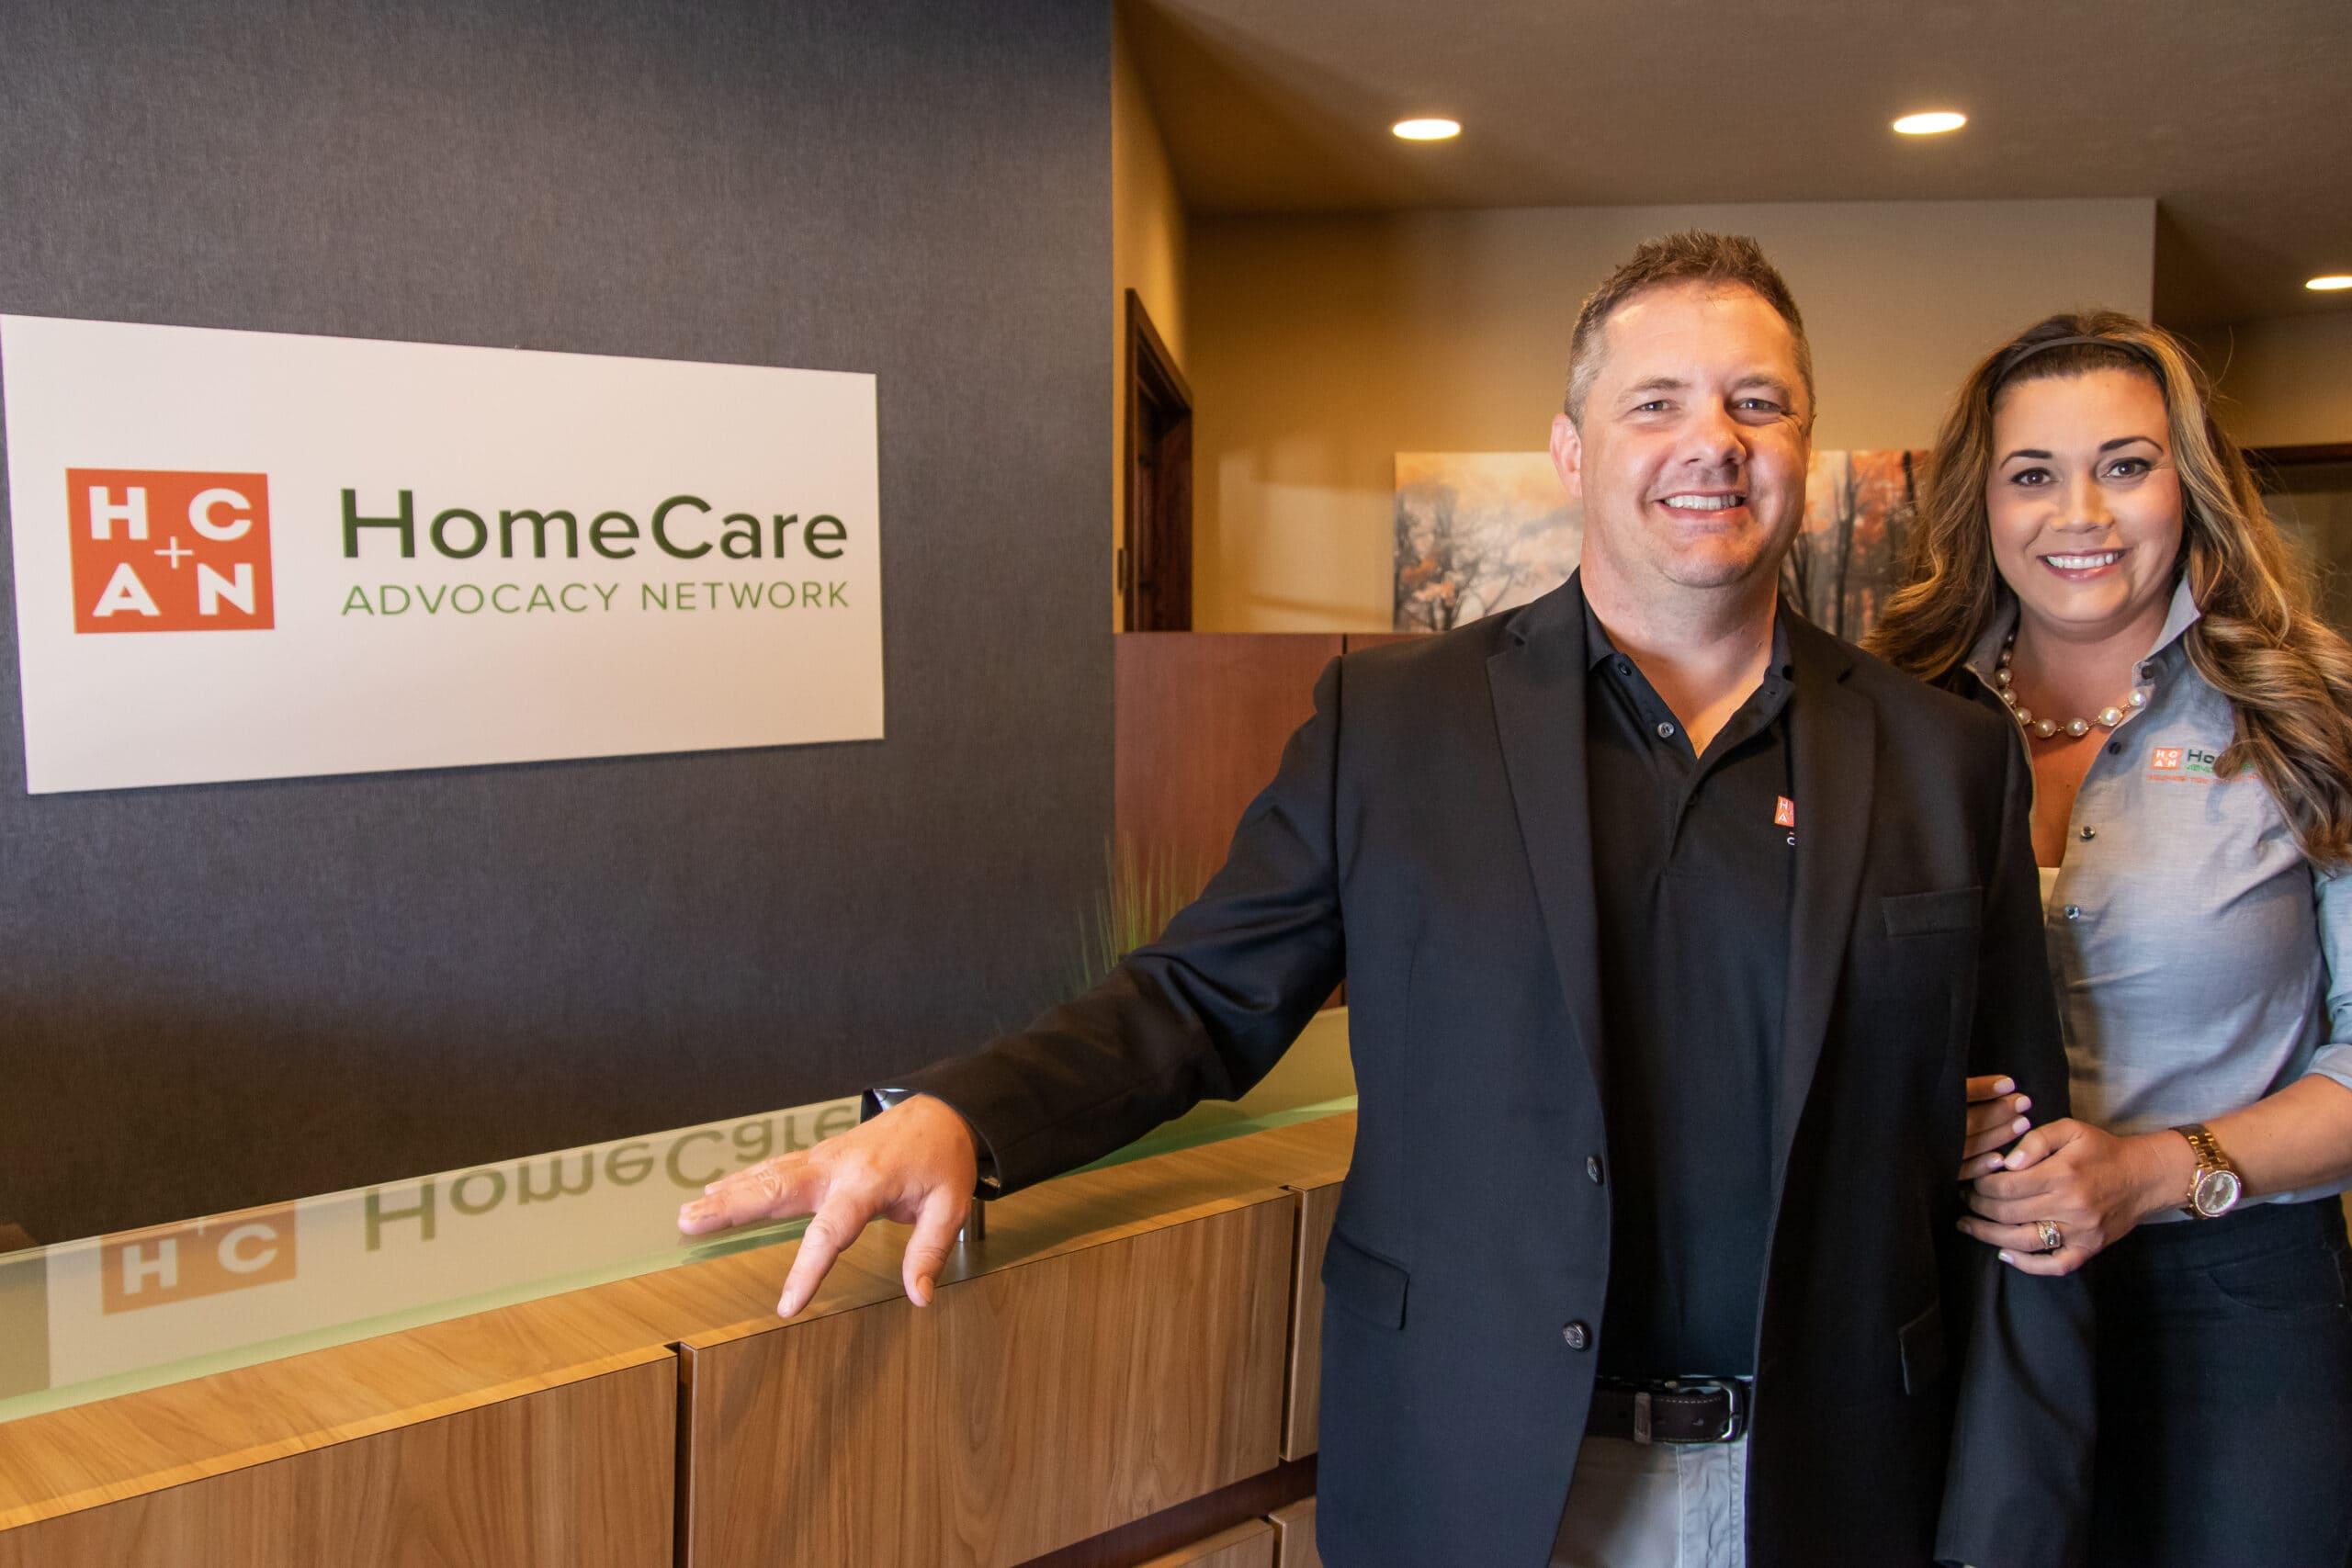 Mark Goetz - Sierra Goetz - HomeCare Advocacy Network.jpg